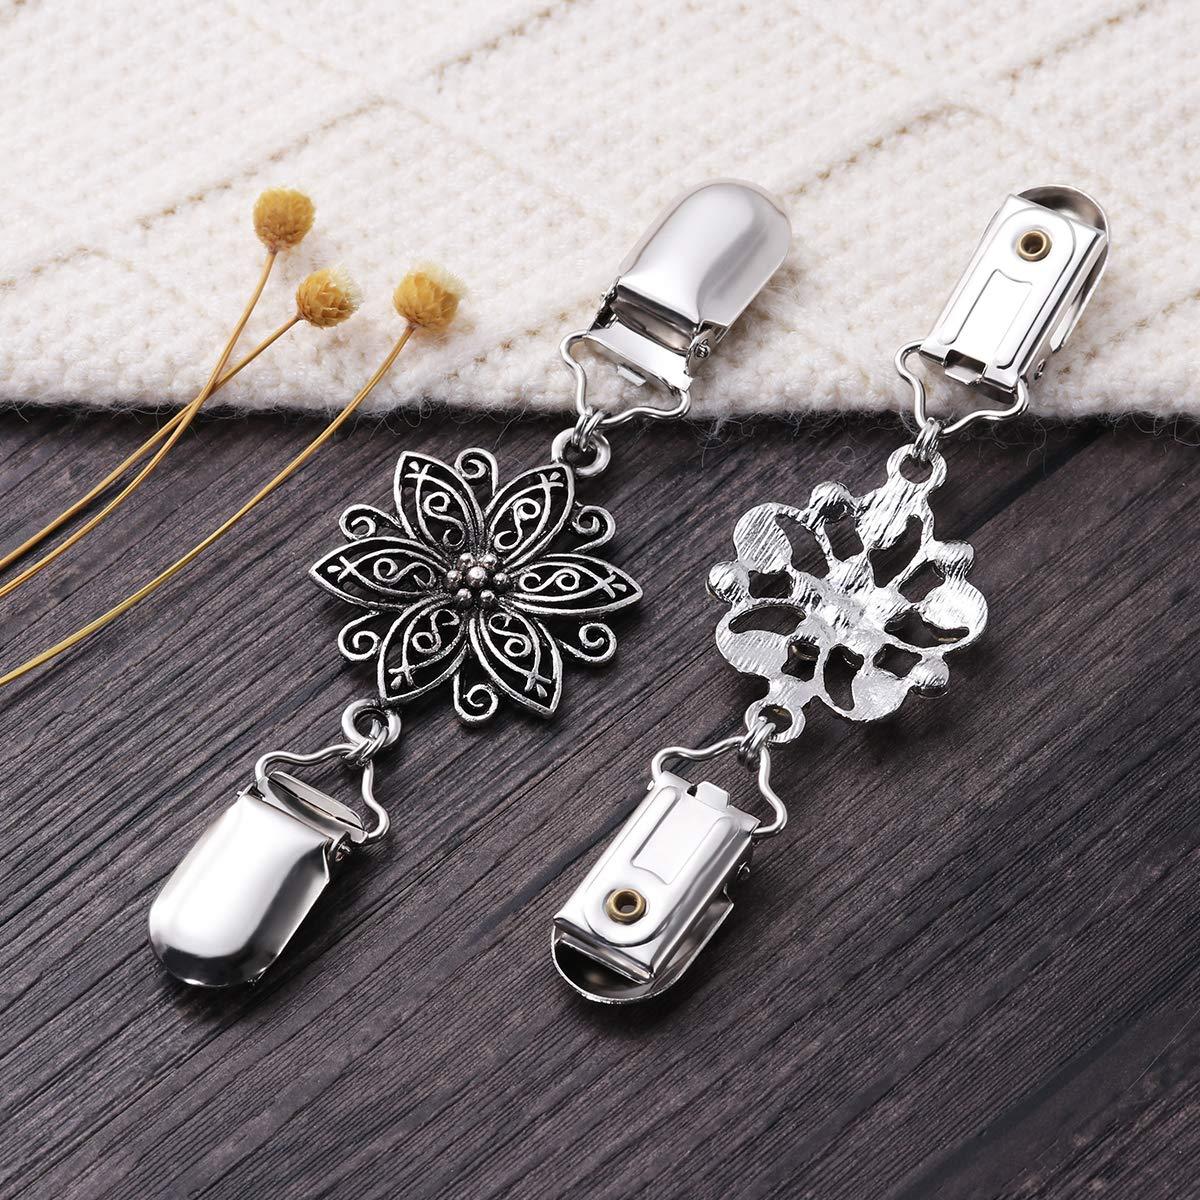 TENDYCOCO BESTOYARD Pullover Clips Vintage Pullover Kette Silber Farbe Strickjacke Clip f/ür Kleid Kleidung 4 st/ücke